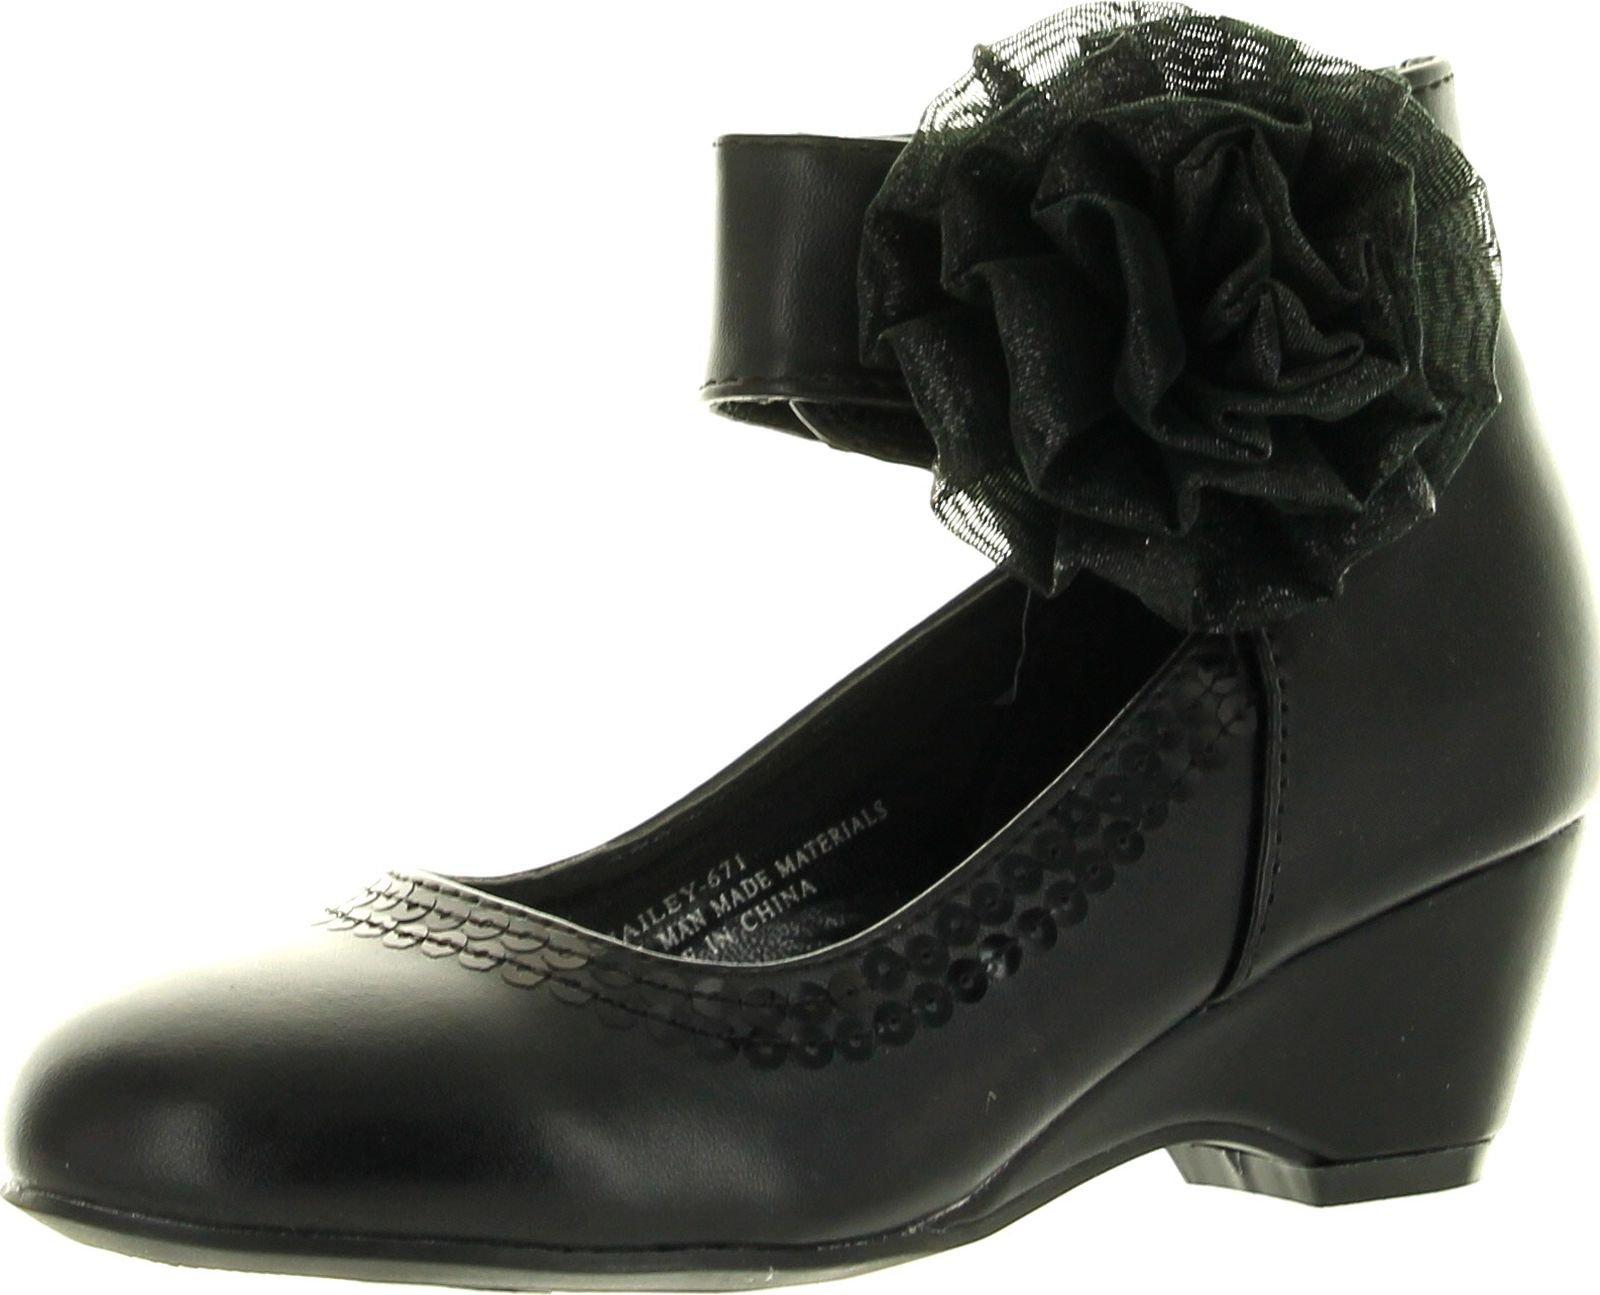 Leatherette Chiffon Bow Ankle Cuff Kiddie Heel Wedge Sandal (Toddler/Little Girl/Big Girl) BA62 - Black (Size: Little Kid 12)